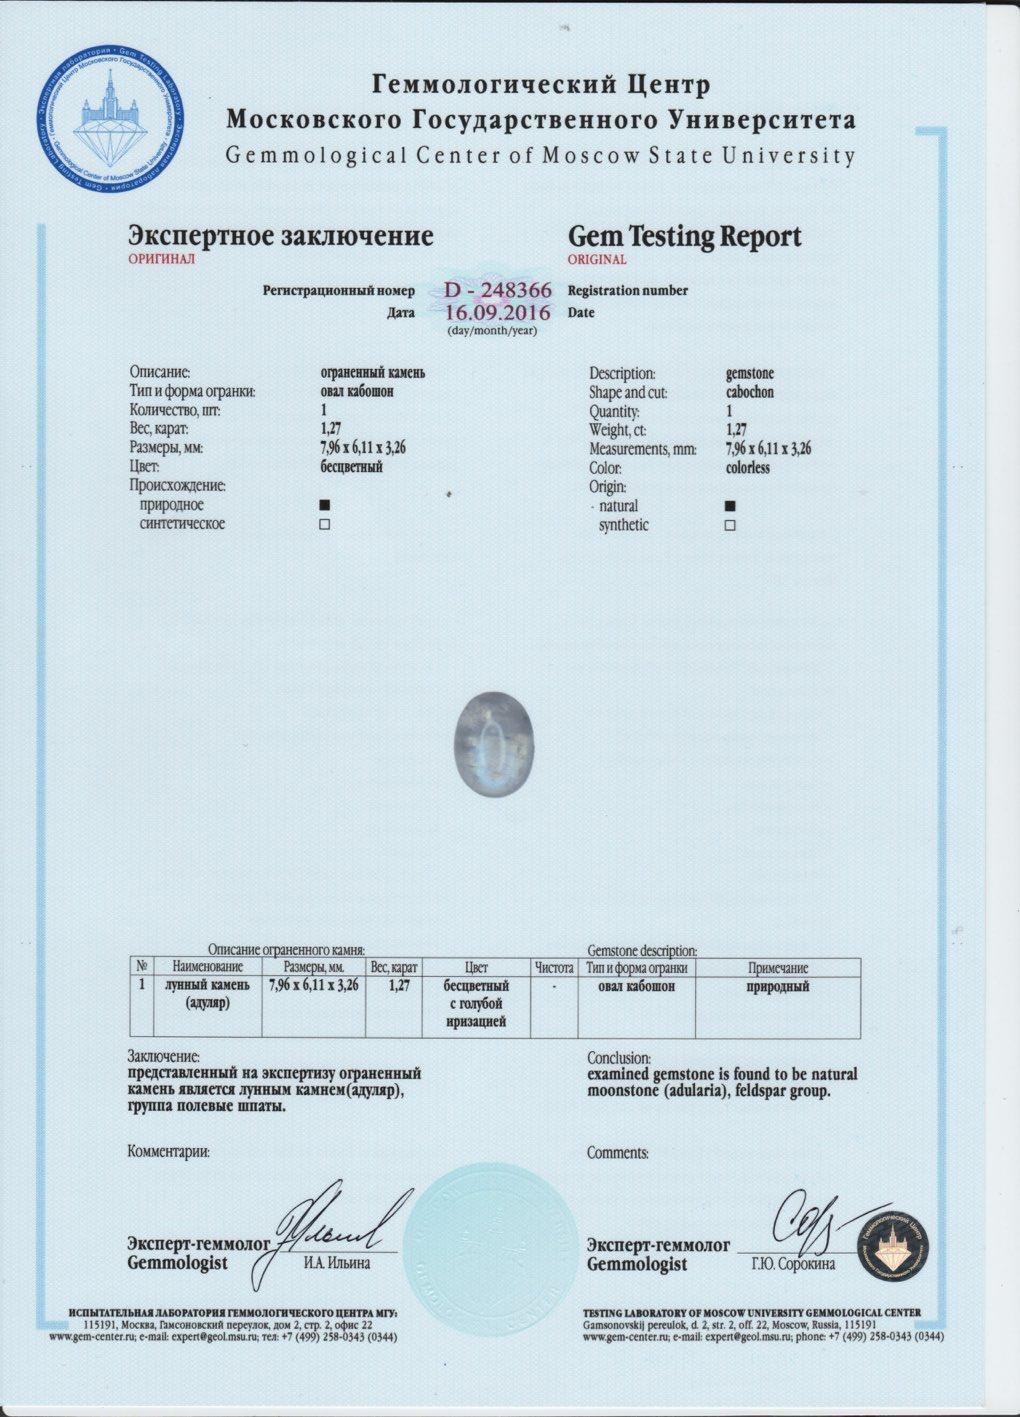 https://mineralmarket.ru/img/certificate/70/1485964463.jpeg